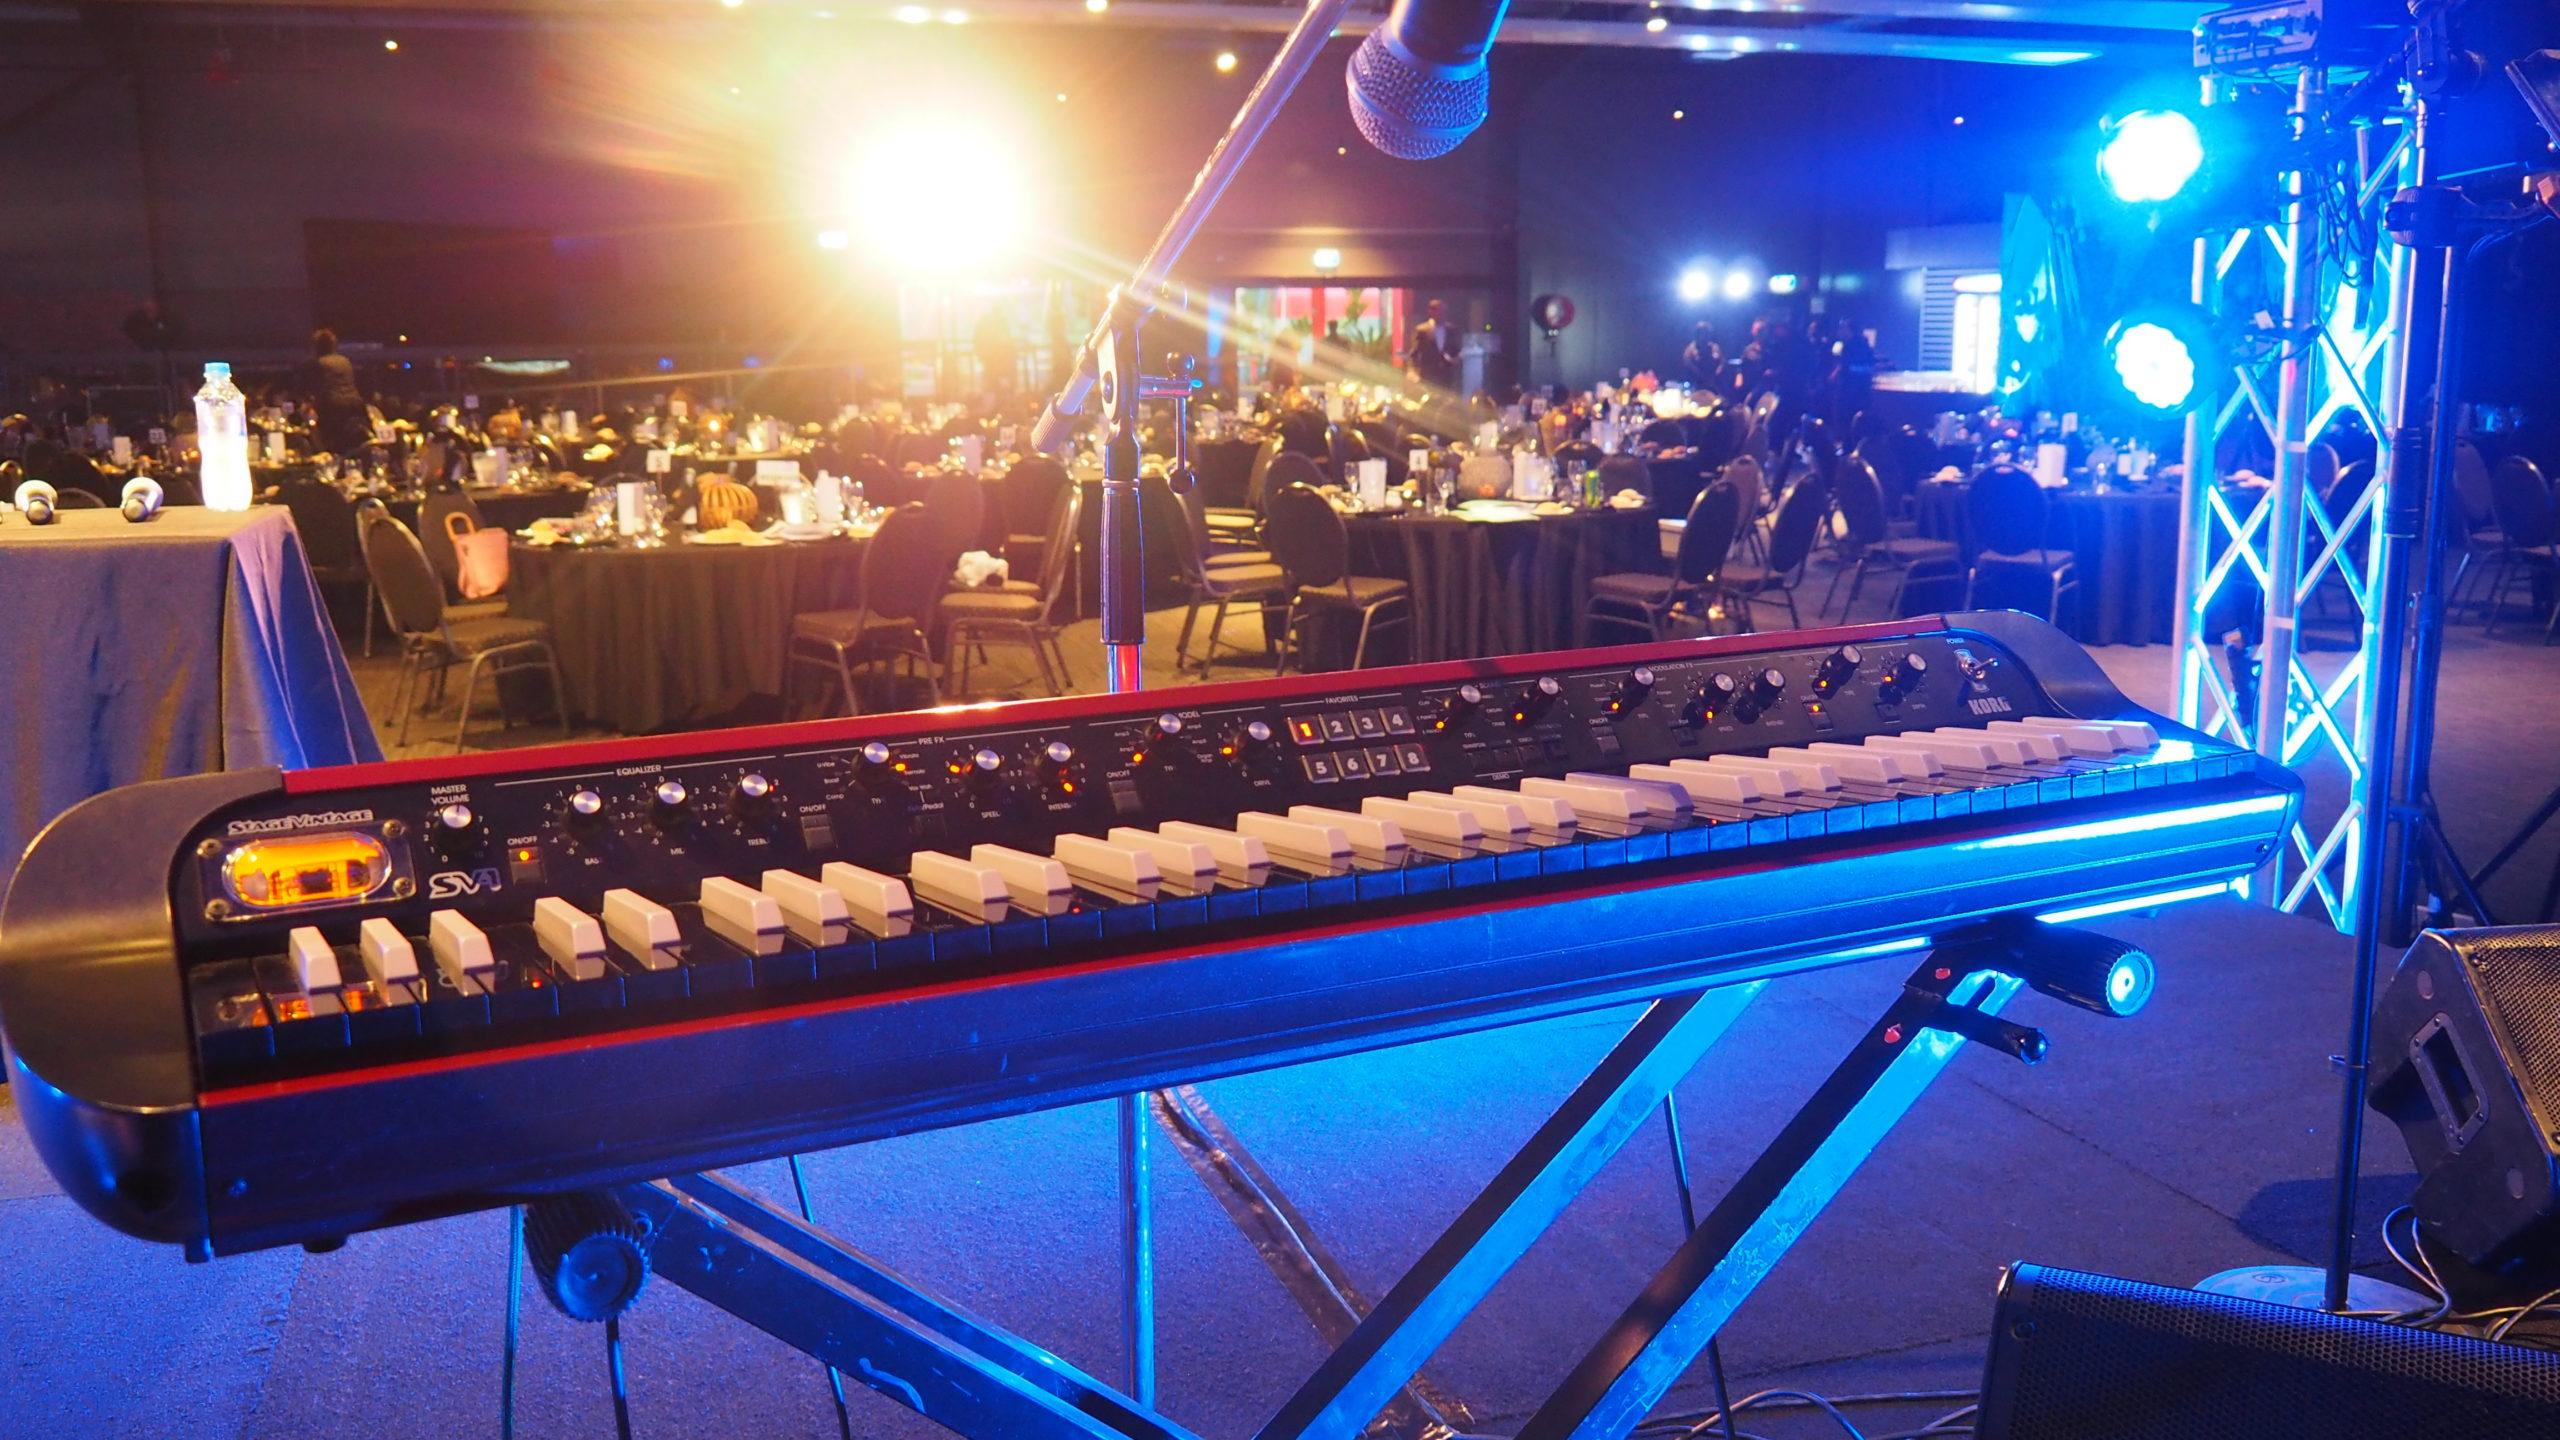 Redtie at Phillips Electronics Gala Night at Dreamworld